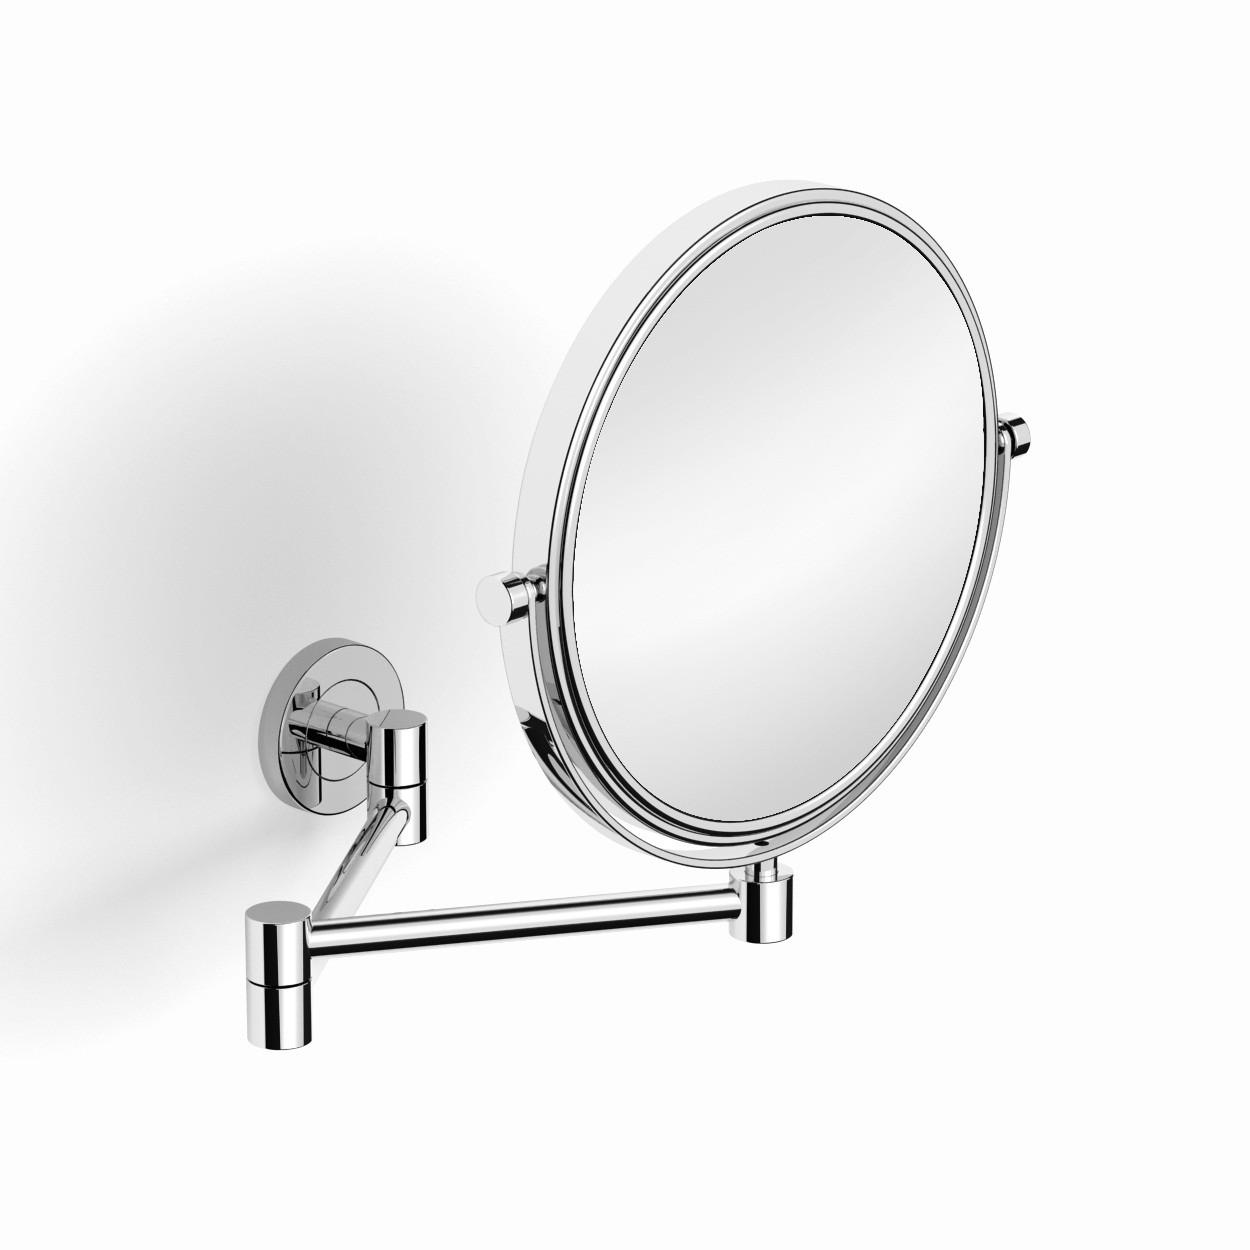 Зеркало настенное для ванны 58217 бронза